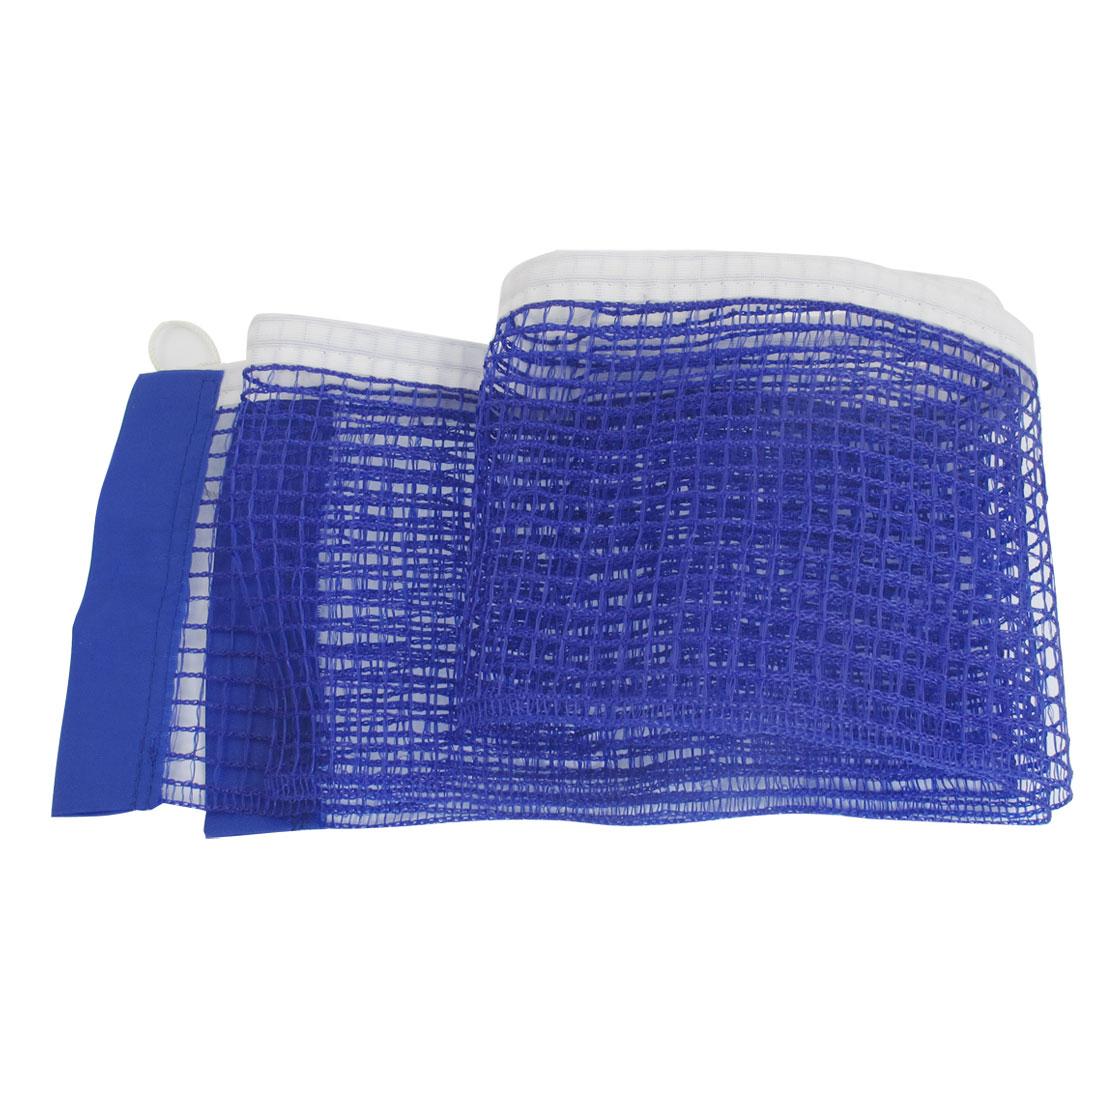 Nylon Replacement Table Pingpong Sports Tennis Mesh Net w Pull String Blue